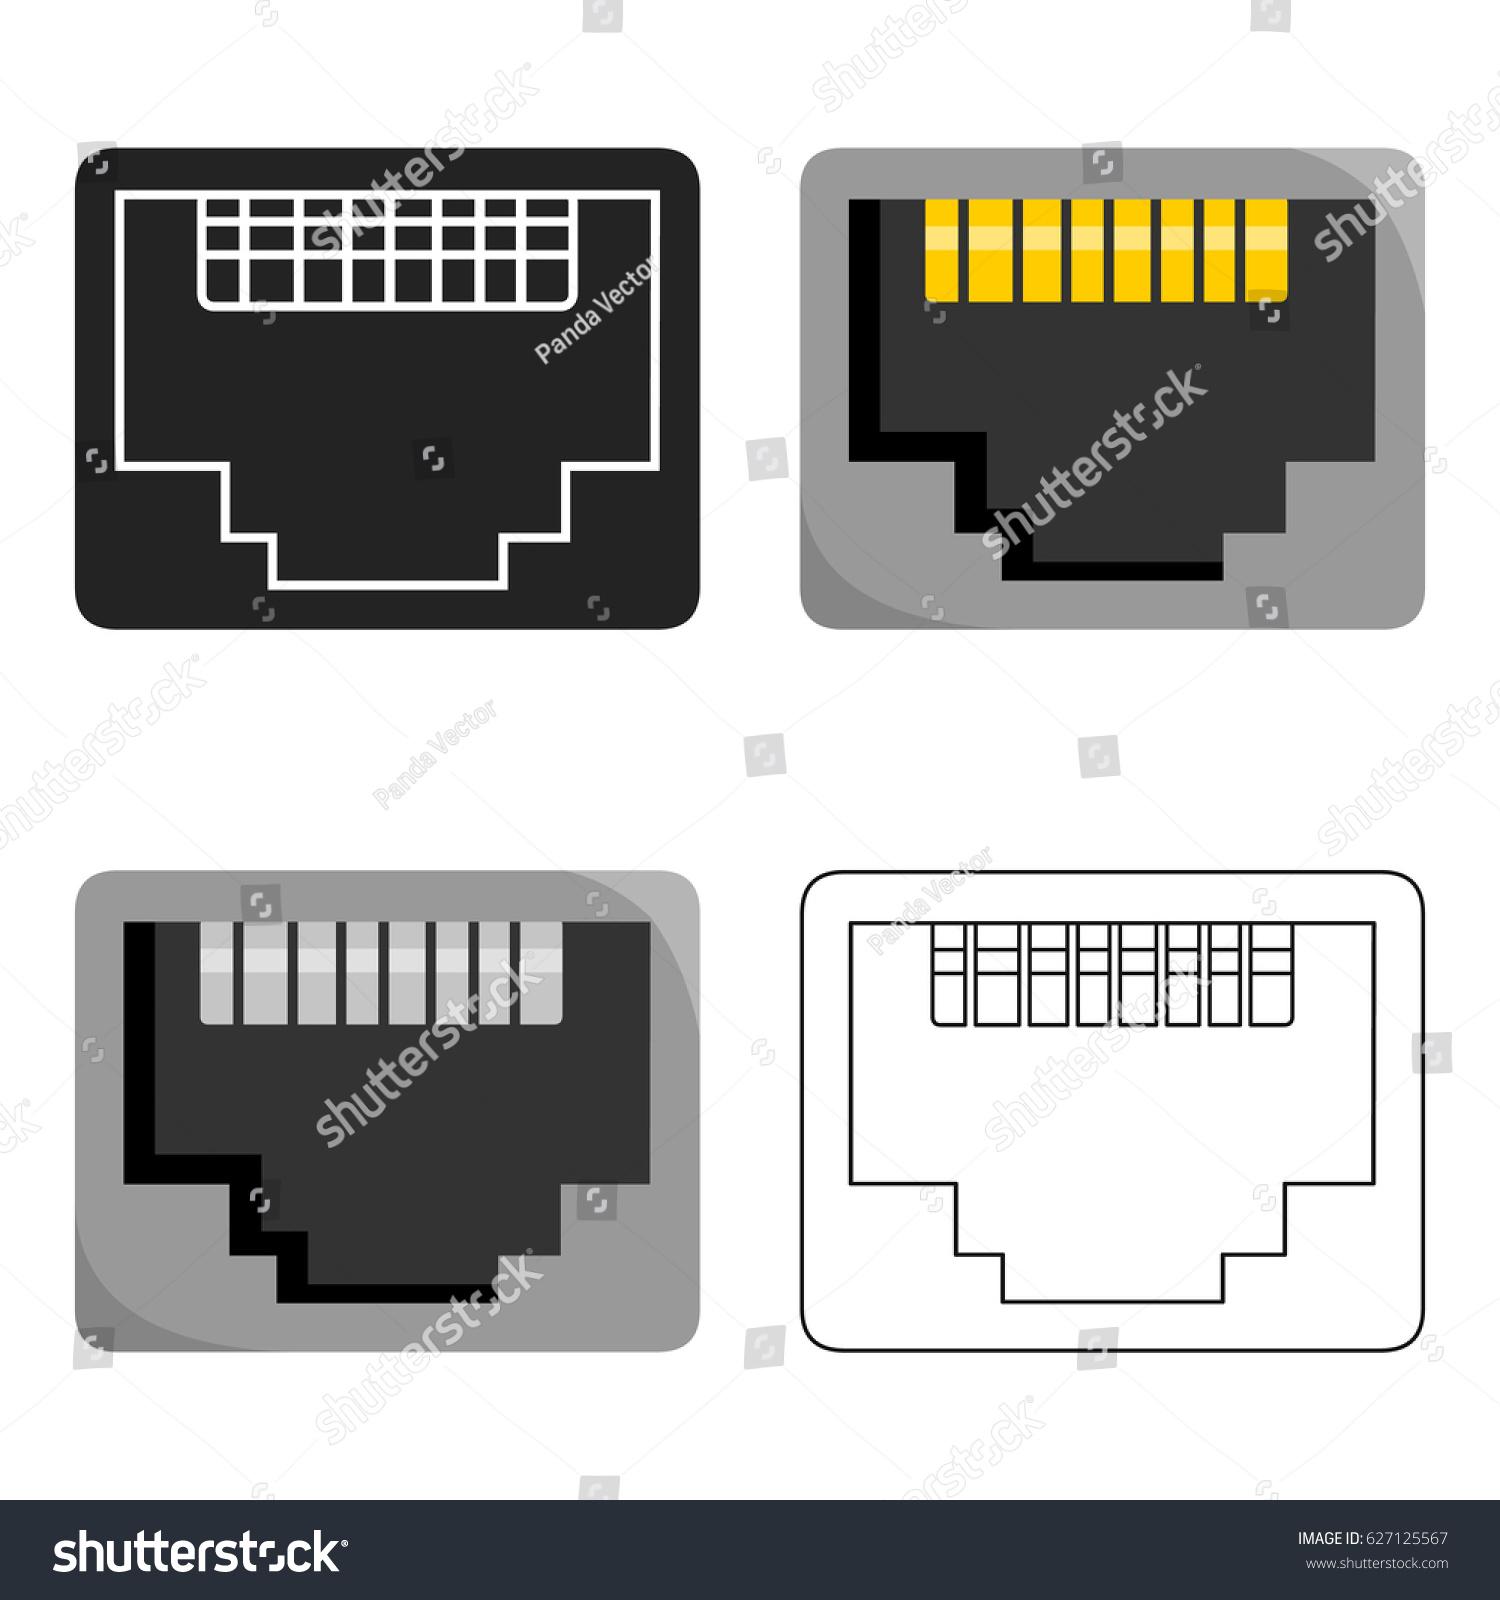 Network port symbol choice image symbol and sign ideas lan port icon cartoon style isolated stock vector 627125567 lan port icon in cartoon style isolated buycottarizona